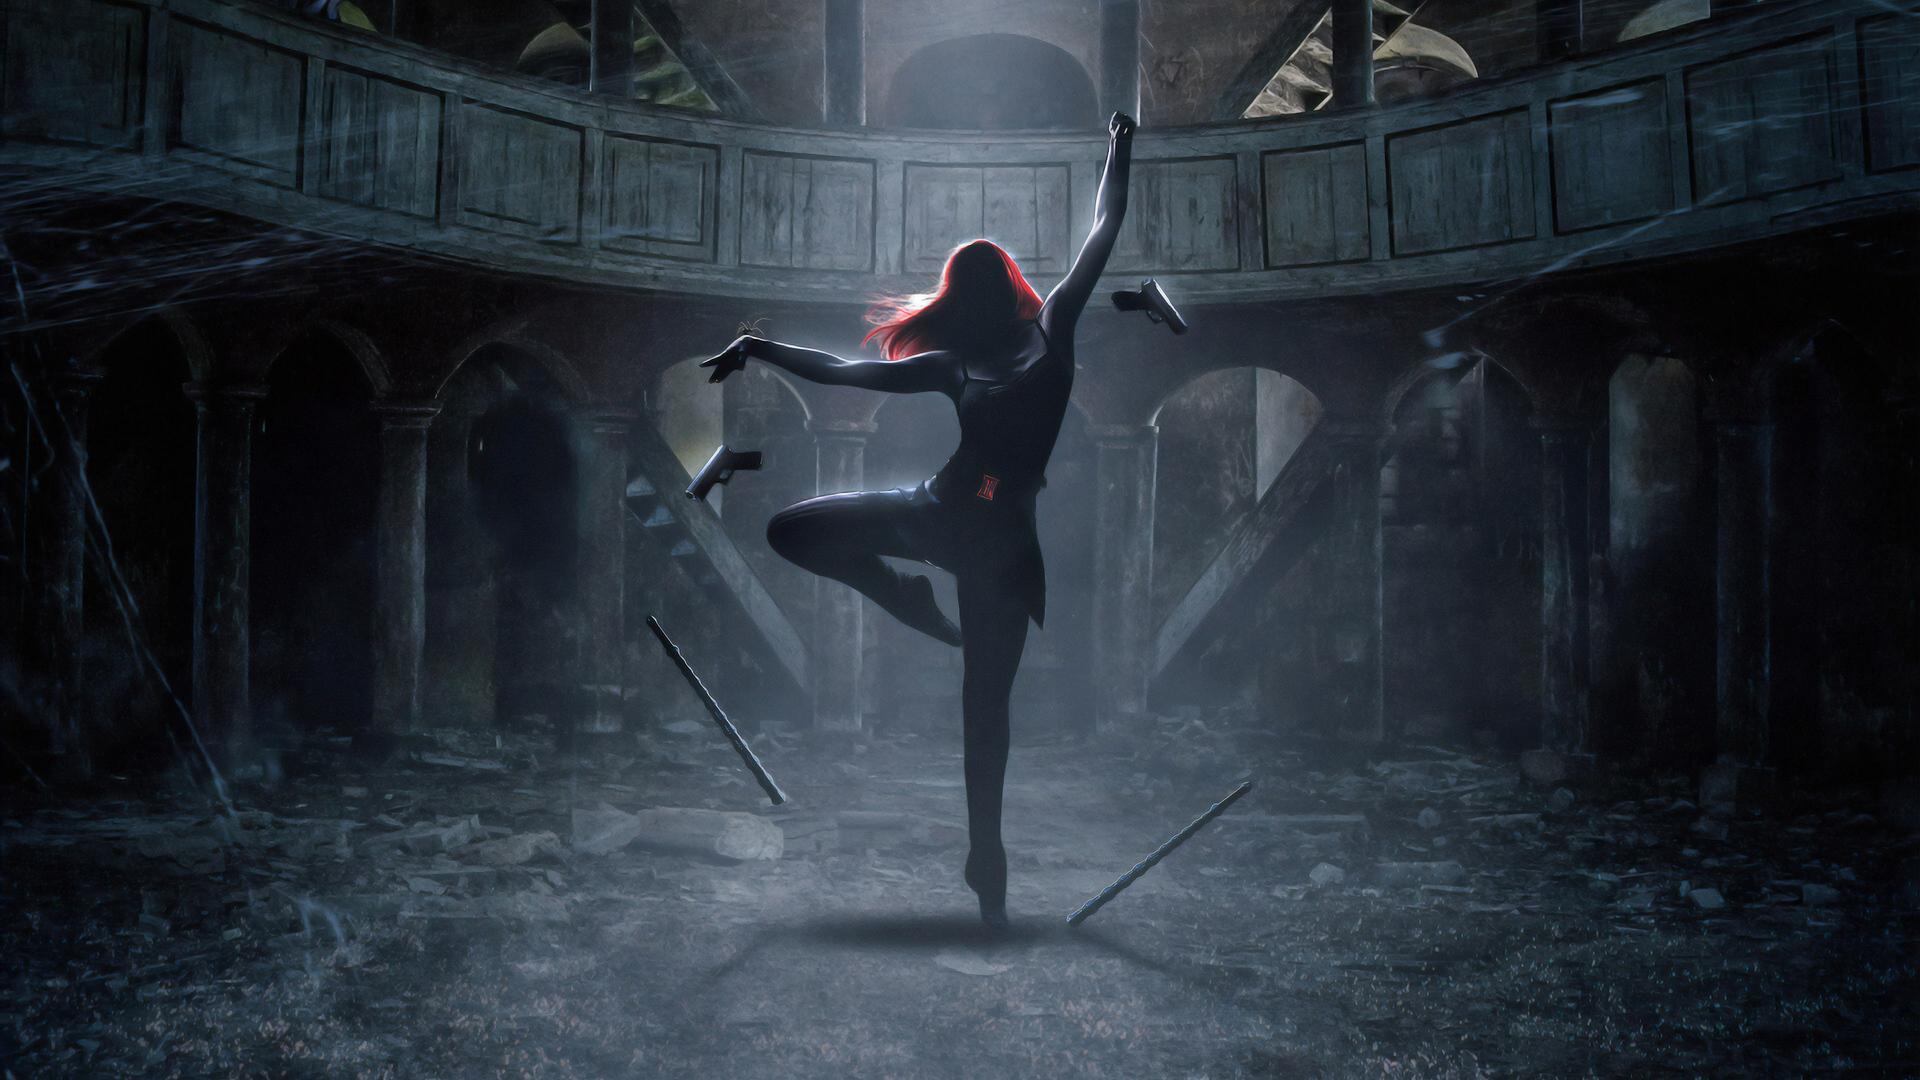 1920x1080 Black Widow The Dance 4k Laptop Full HD 1080P HD ...